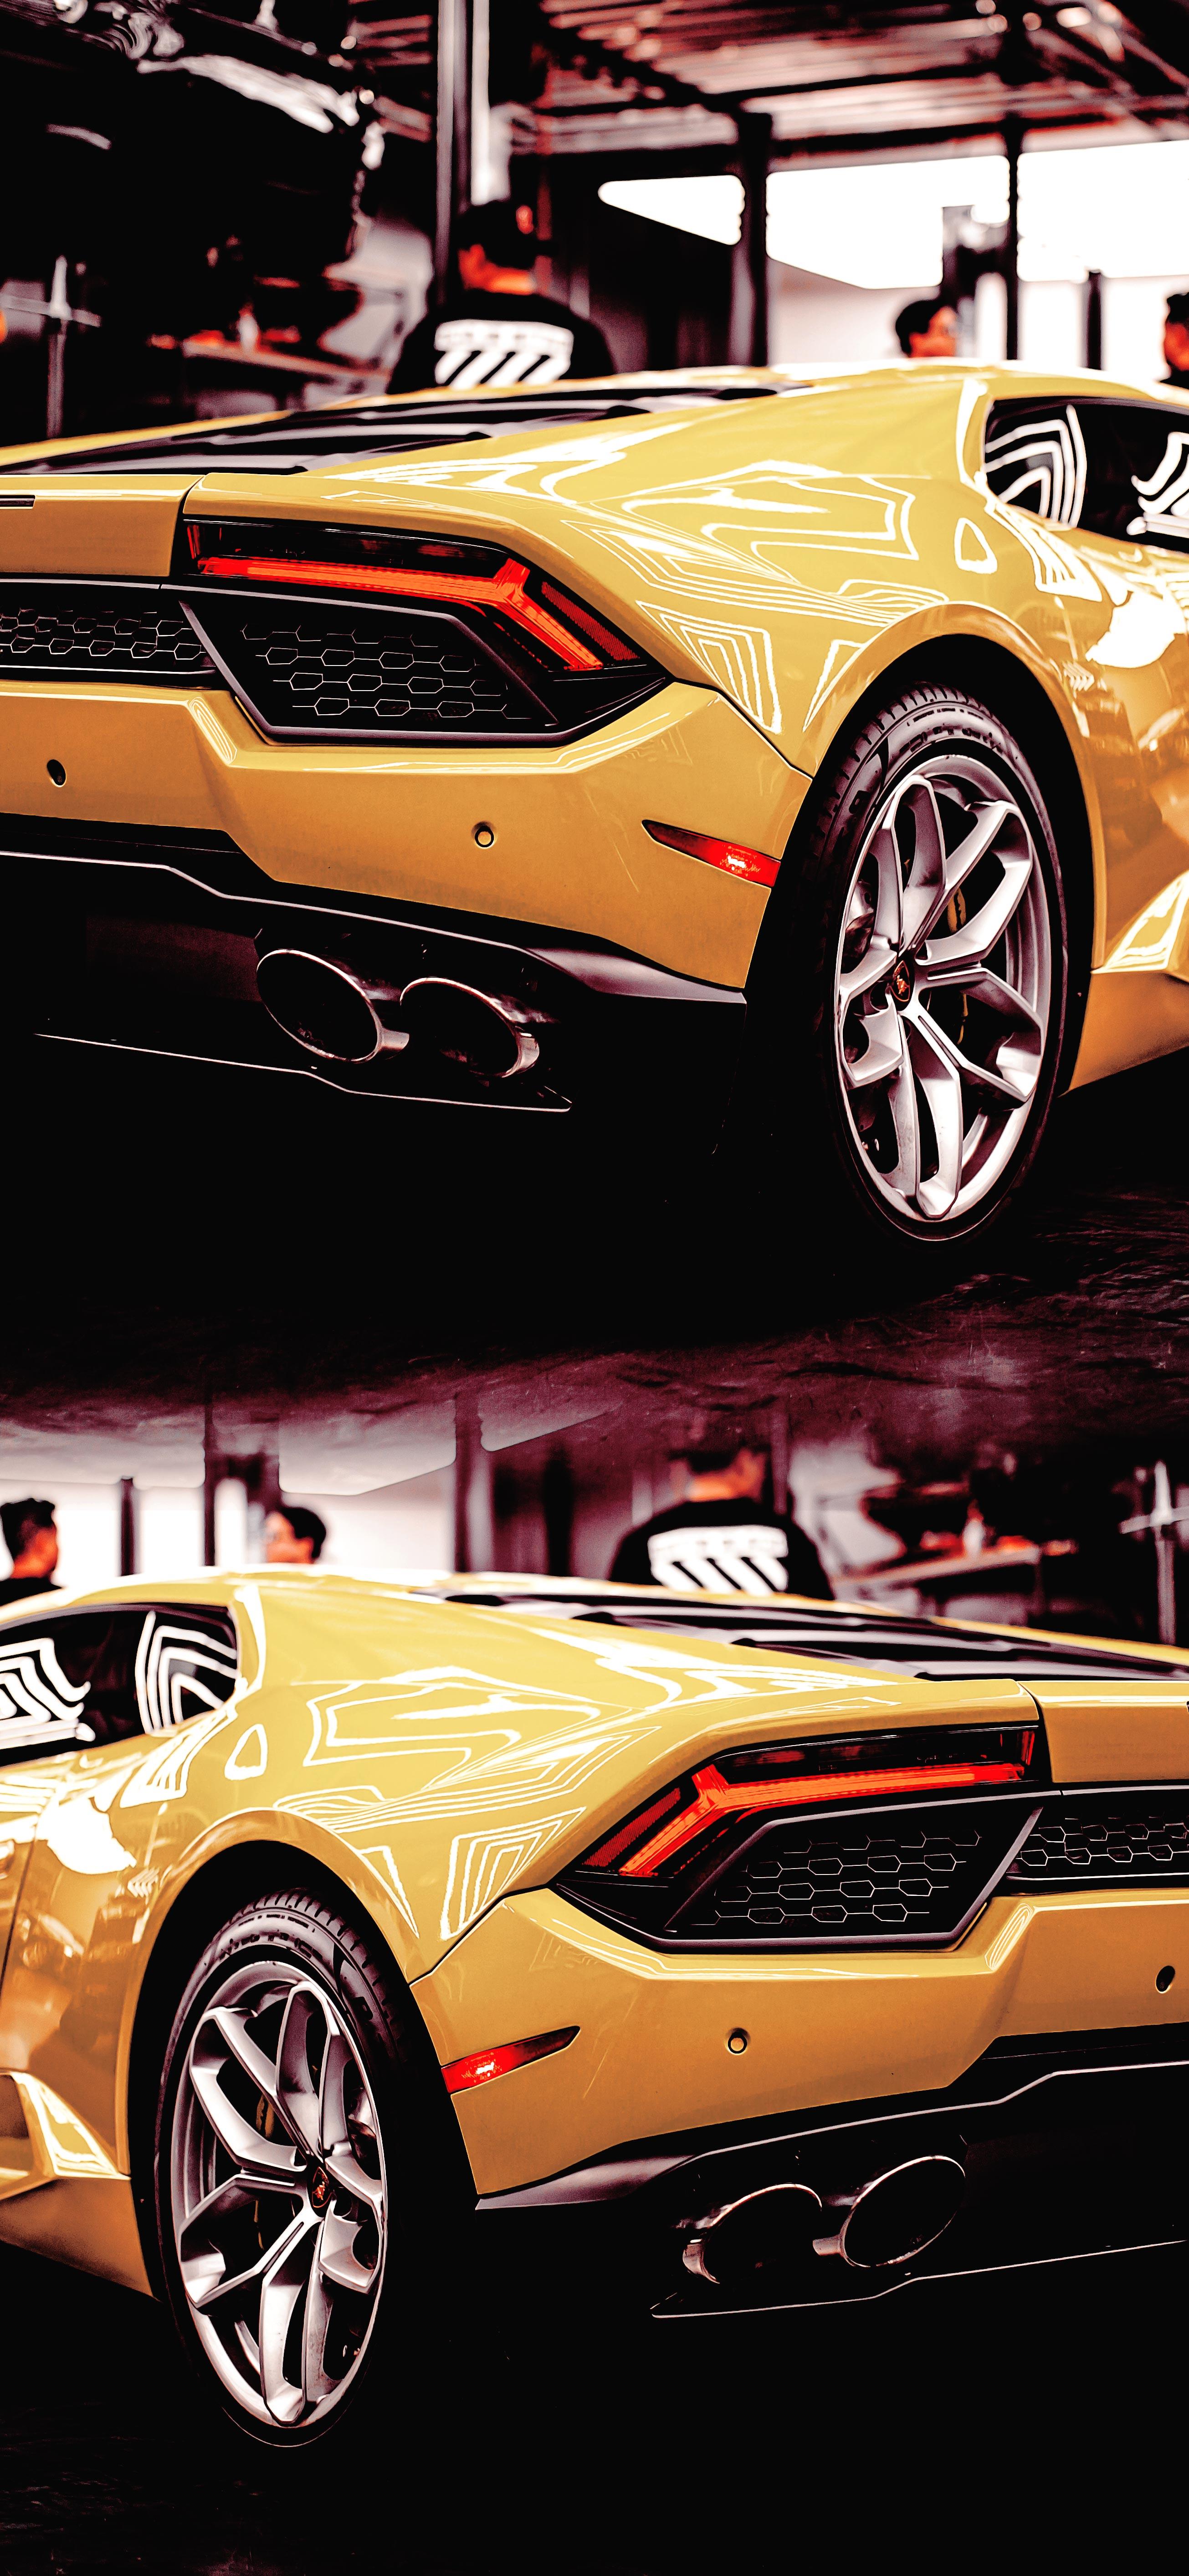 cool-yellow-huracan-Lamborghini-car-wallpaper